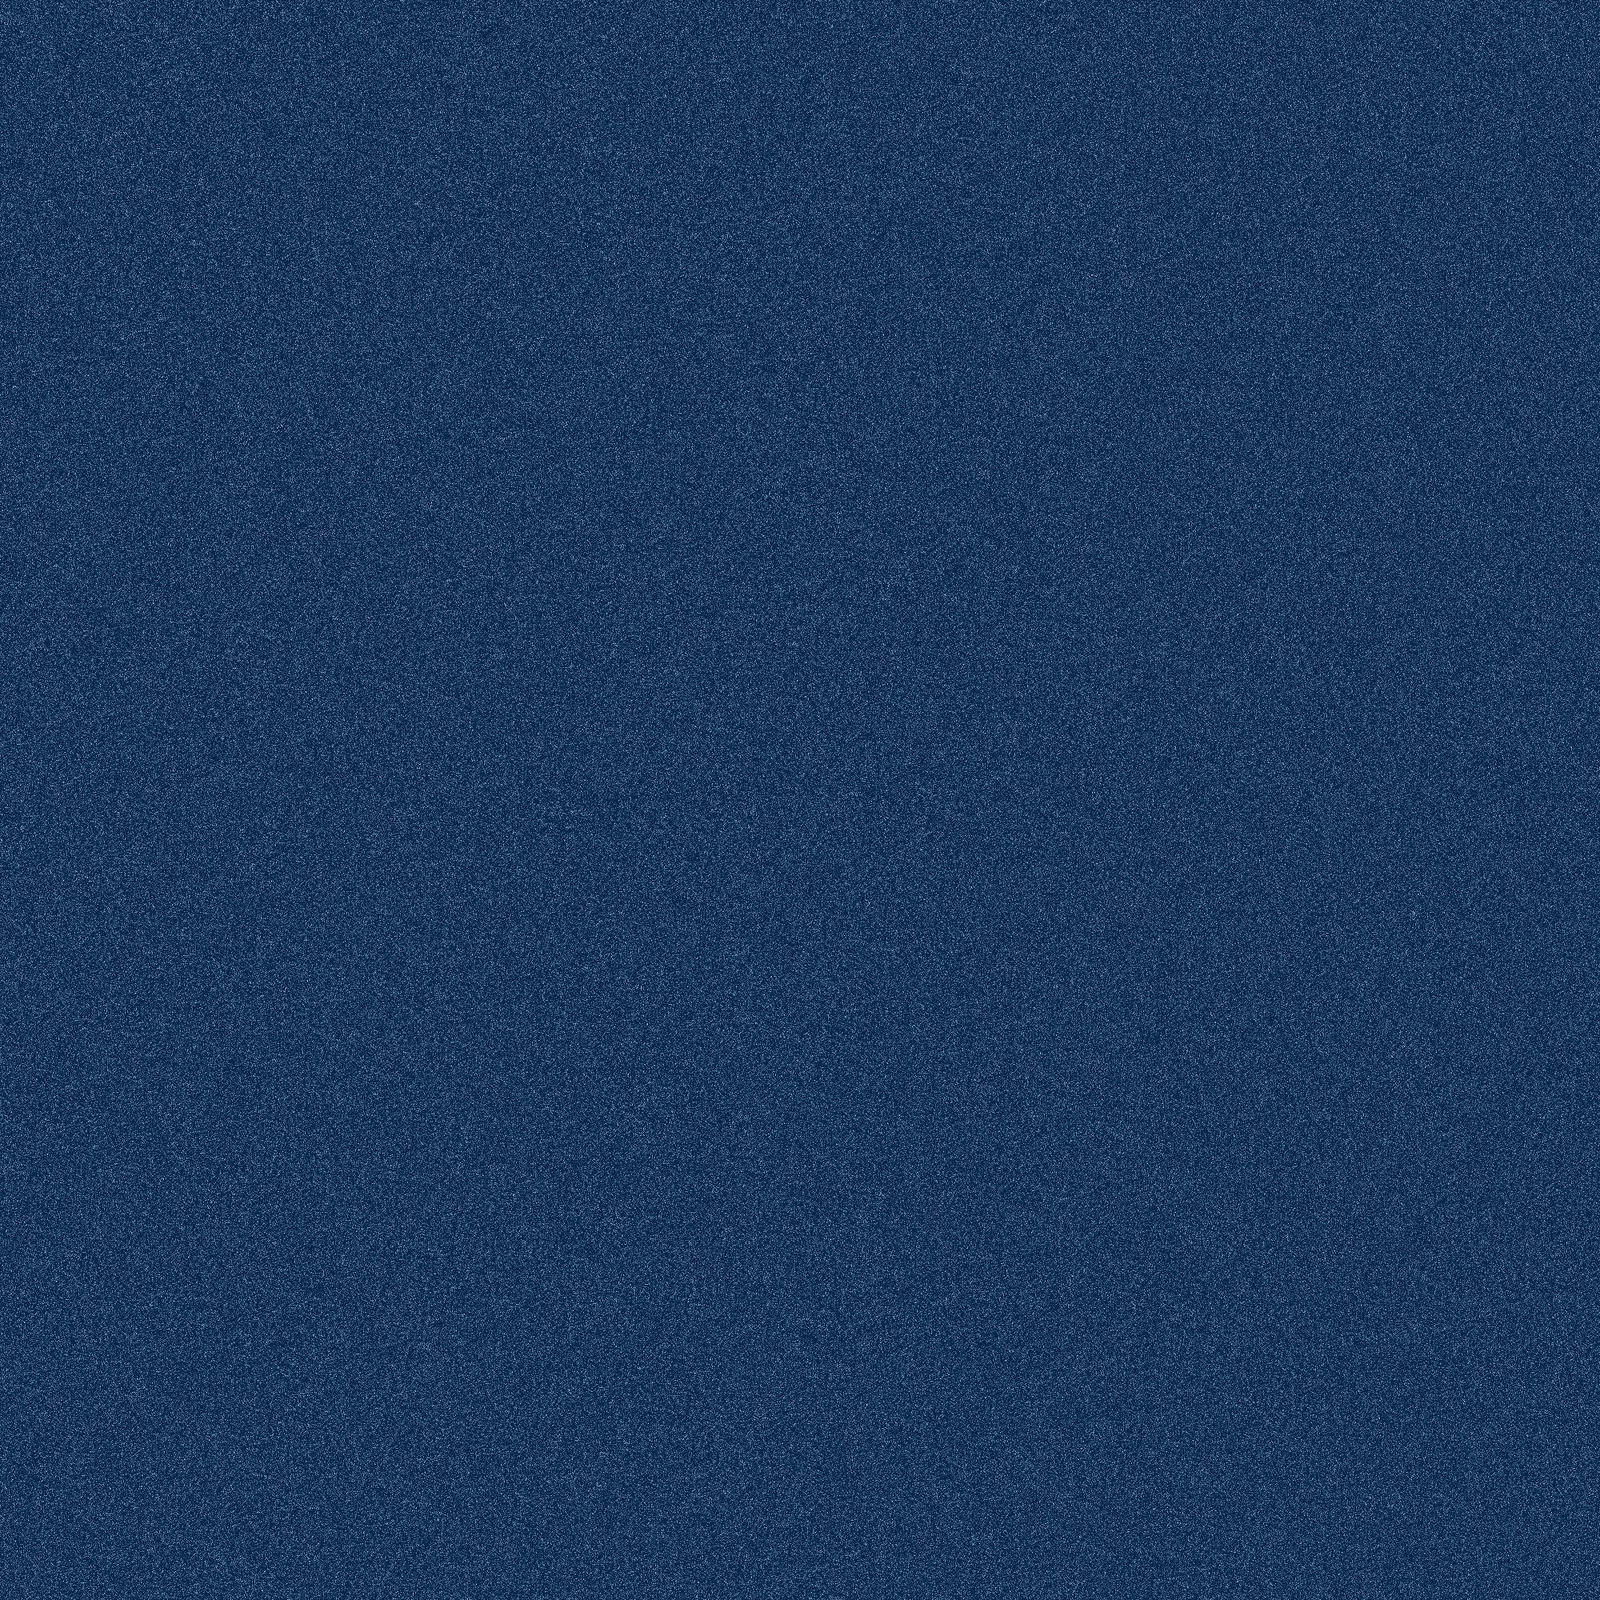 Dark Blue Backgrounds Texture - Wallpaper Cave